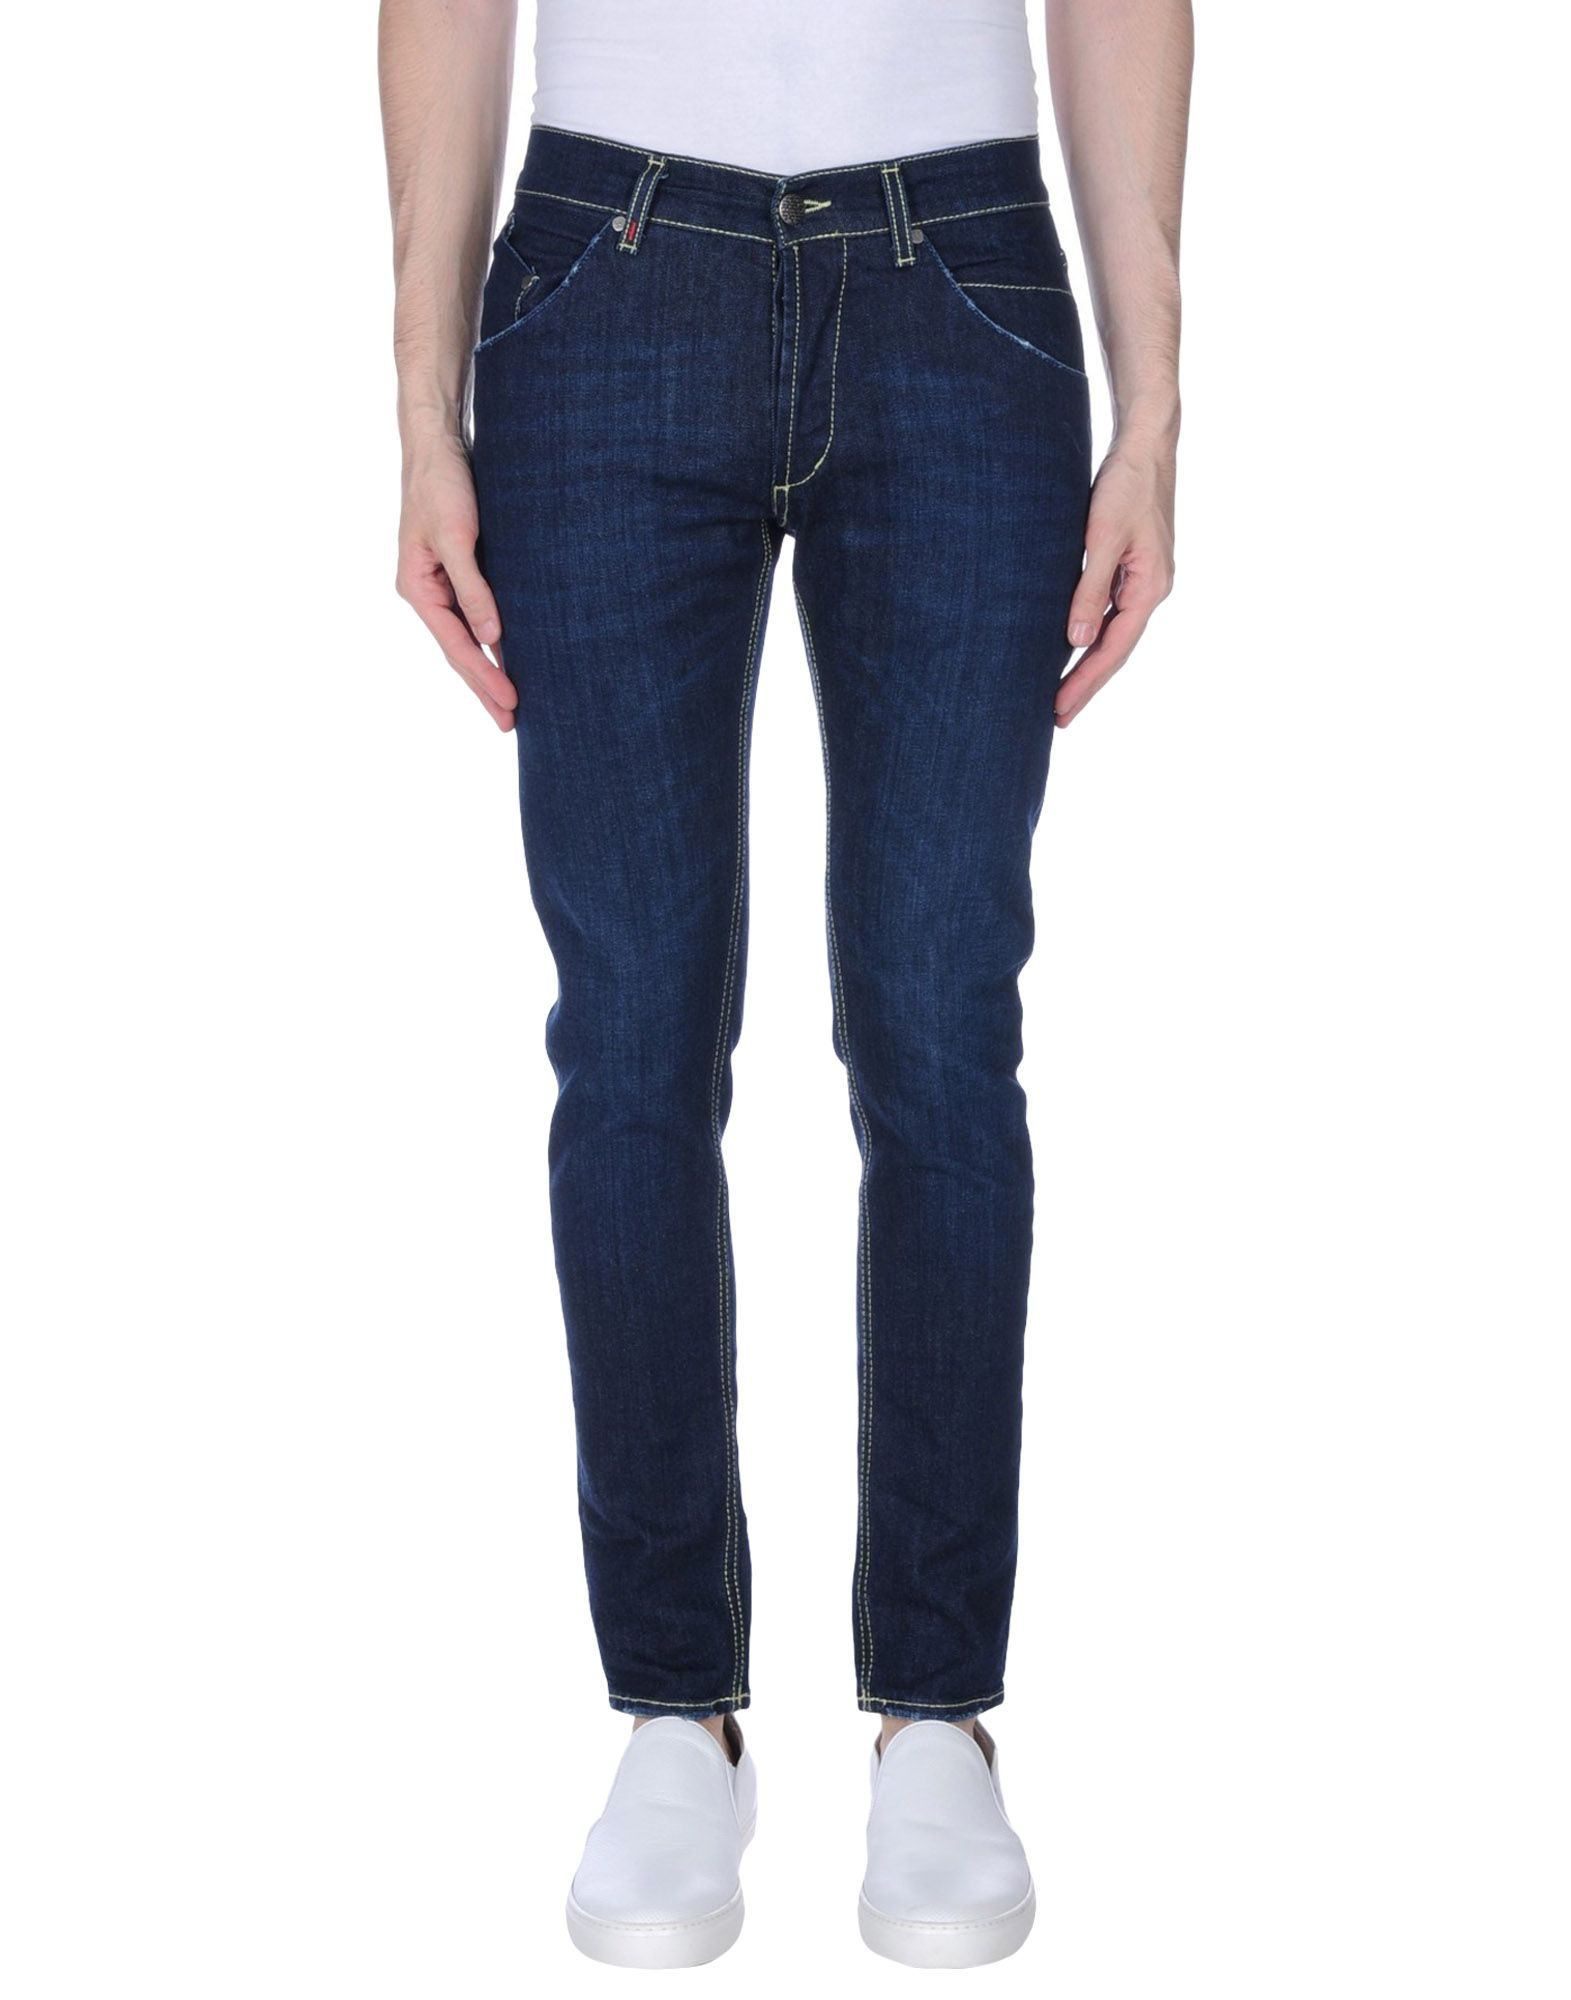 Pantaloni Pantaloni Pantaloni Jeans Dondup Uomo - 42615881OU 8b4052